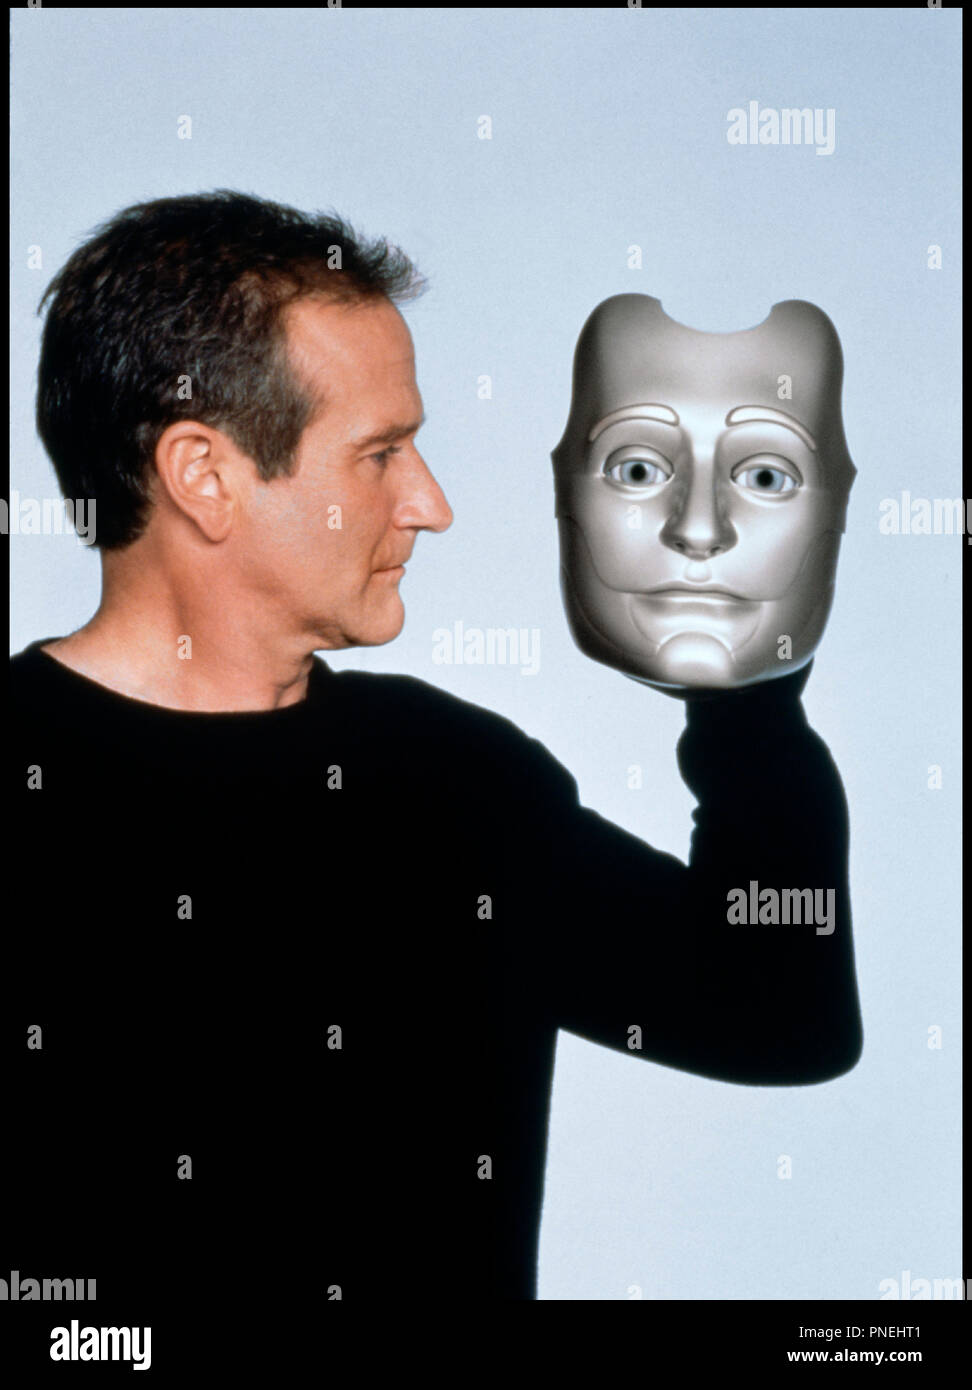 Prod DB © Columbia / DR L'HOMME BICENTENAIRE (BICENTENNIAL MAN) de Chris Columbus 1999 USA avec Robin Williams robot, masque,  d'apres le roman de Isaac Asimov - Stock Image